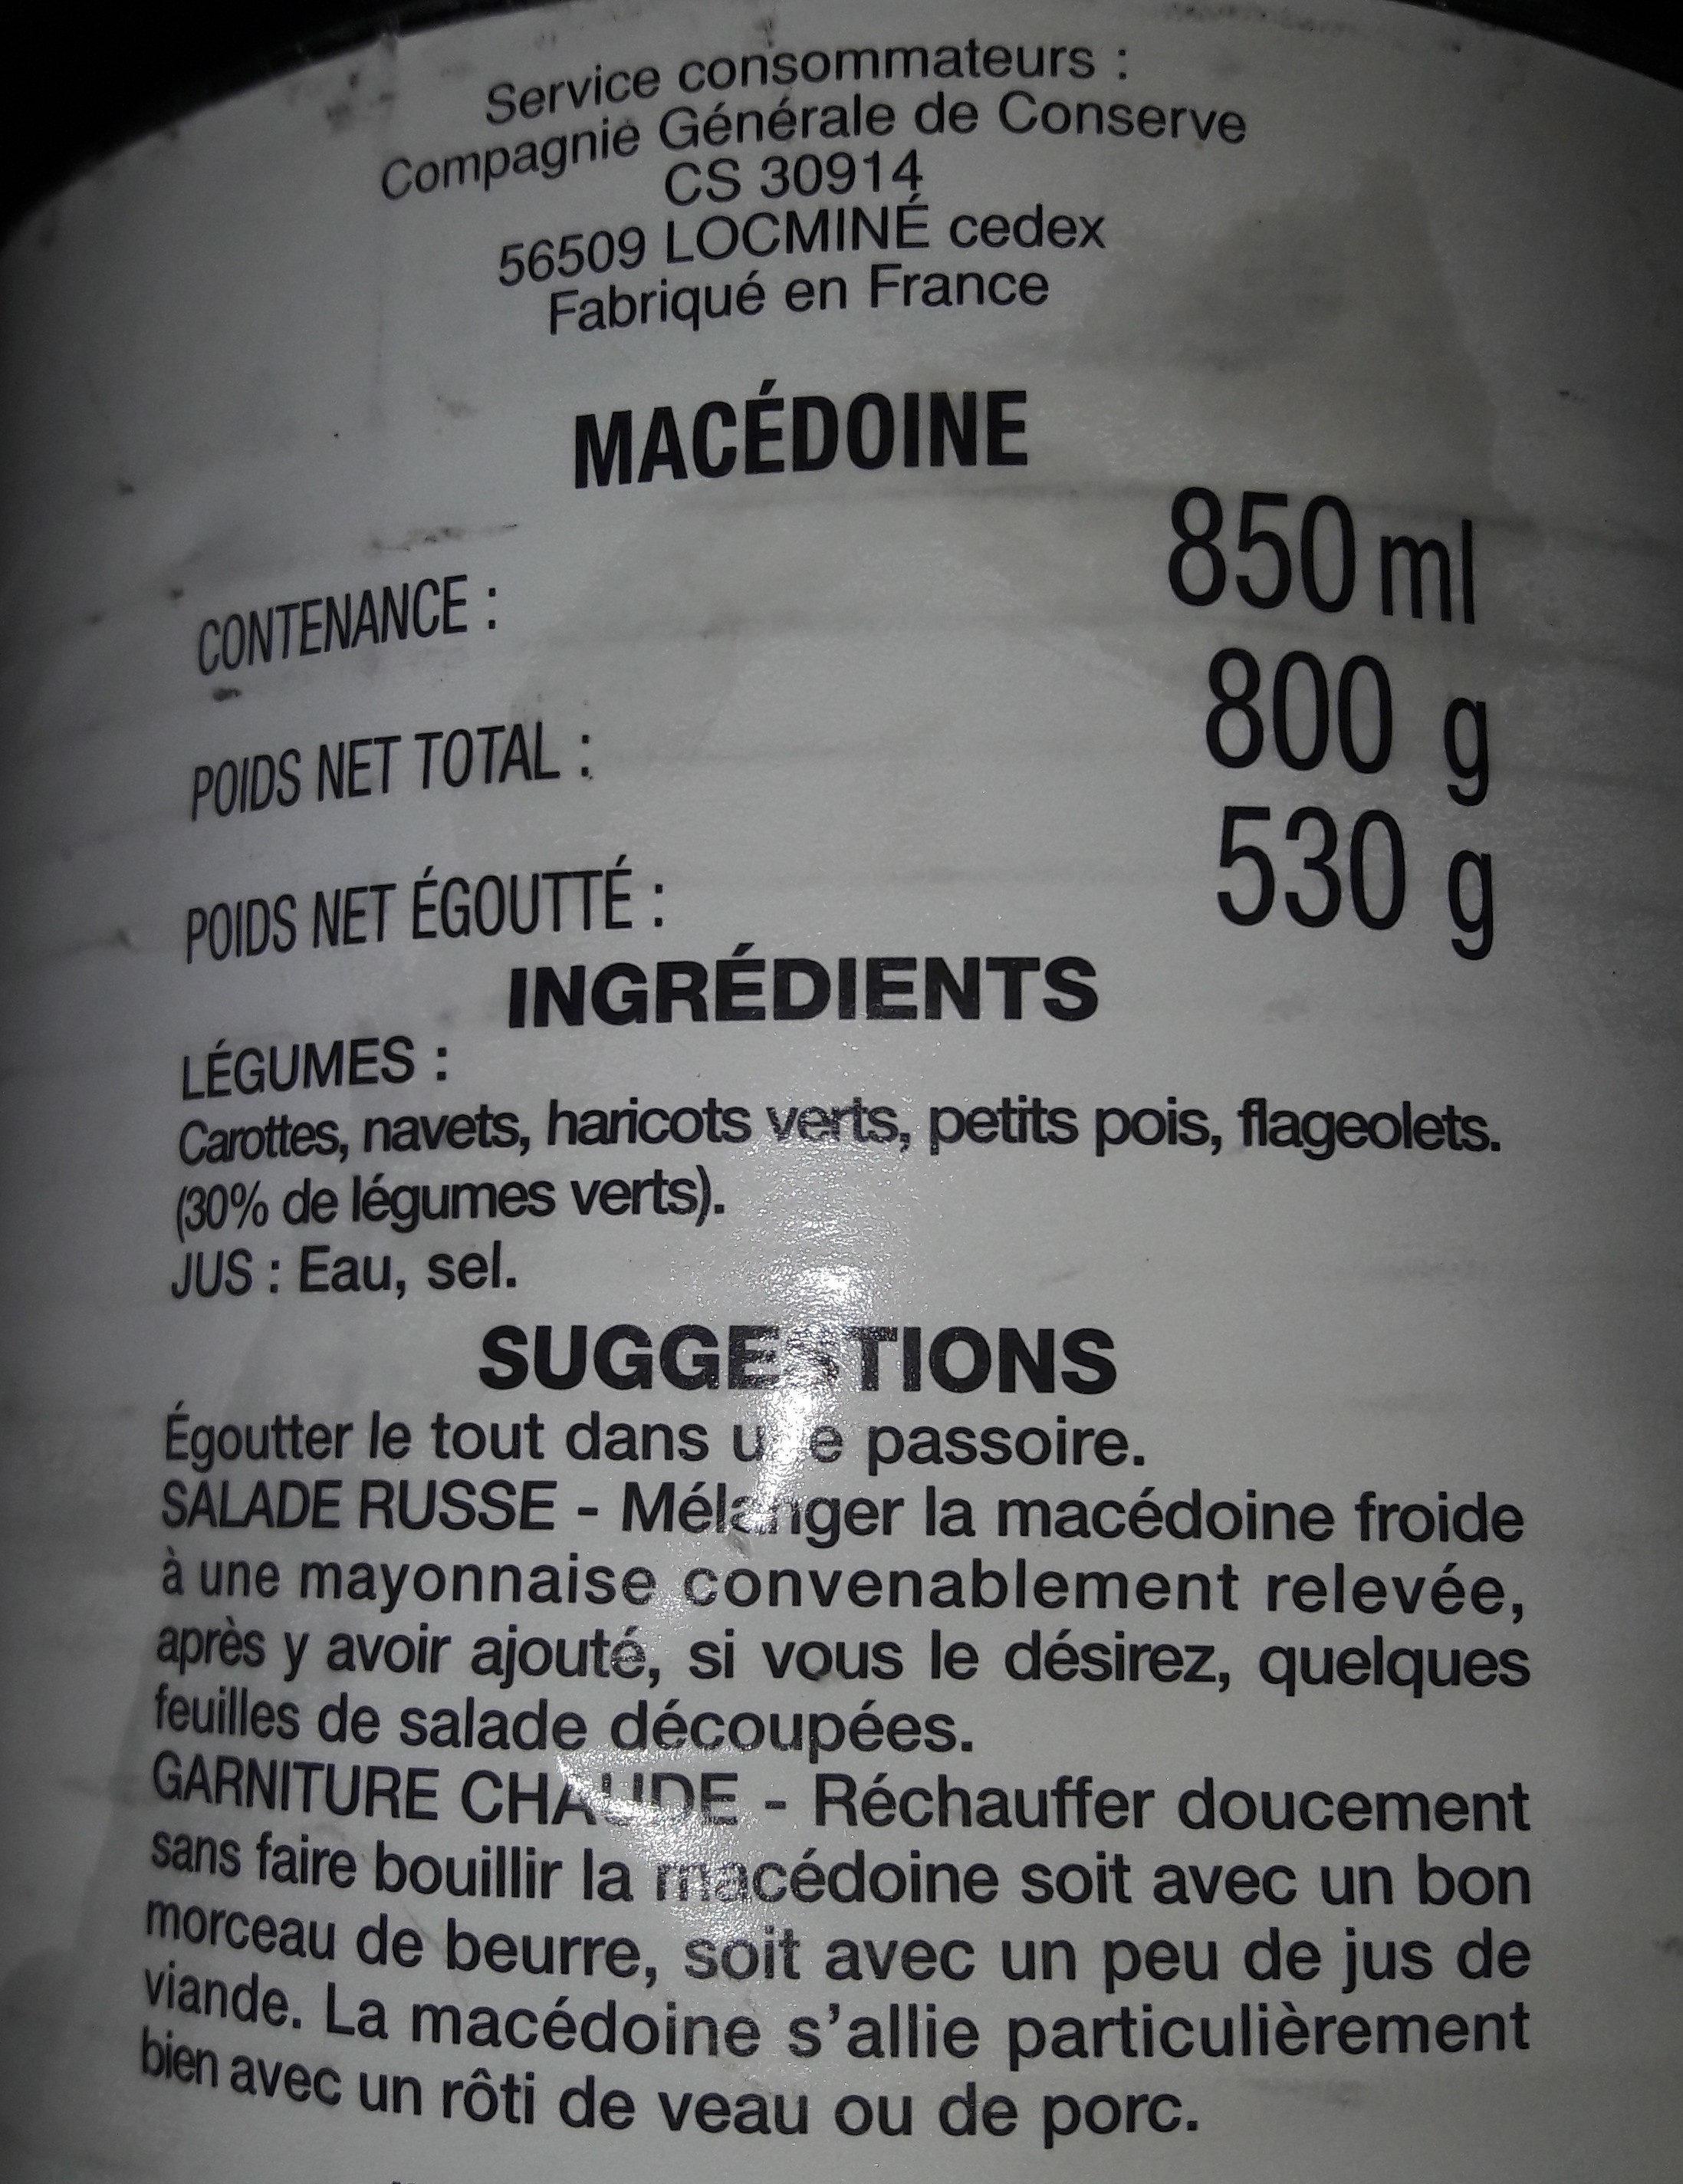 Macédoine - Ingredients